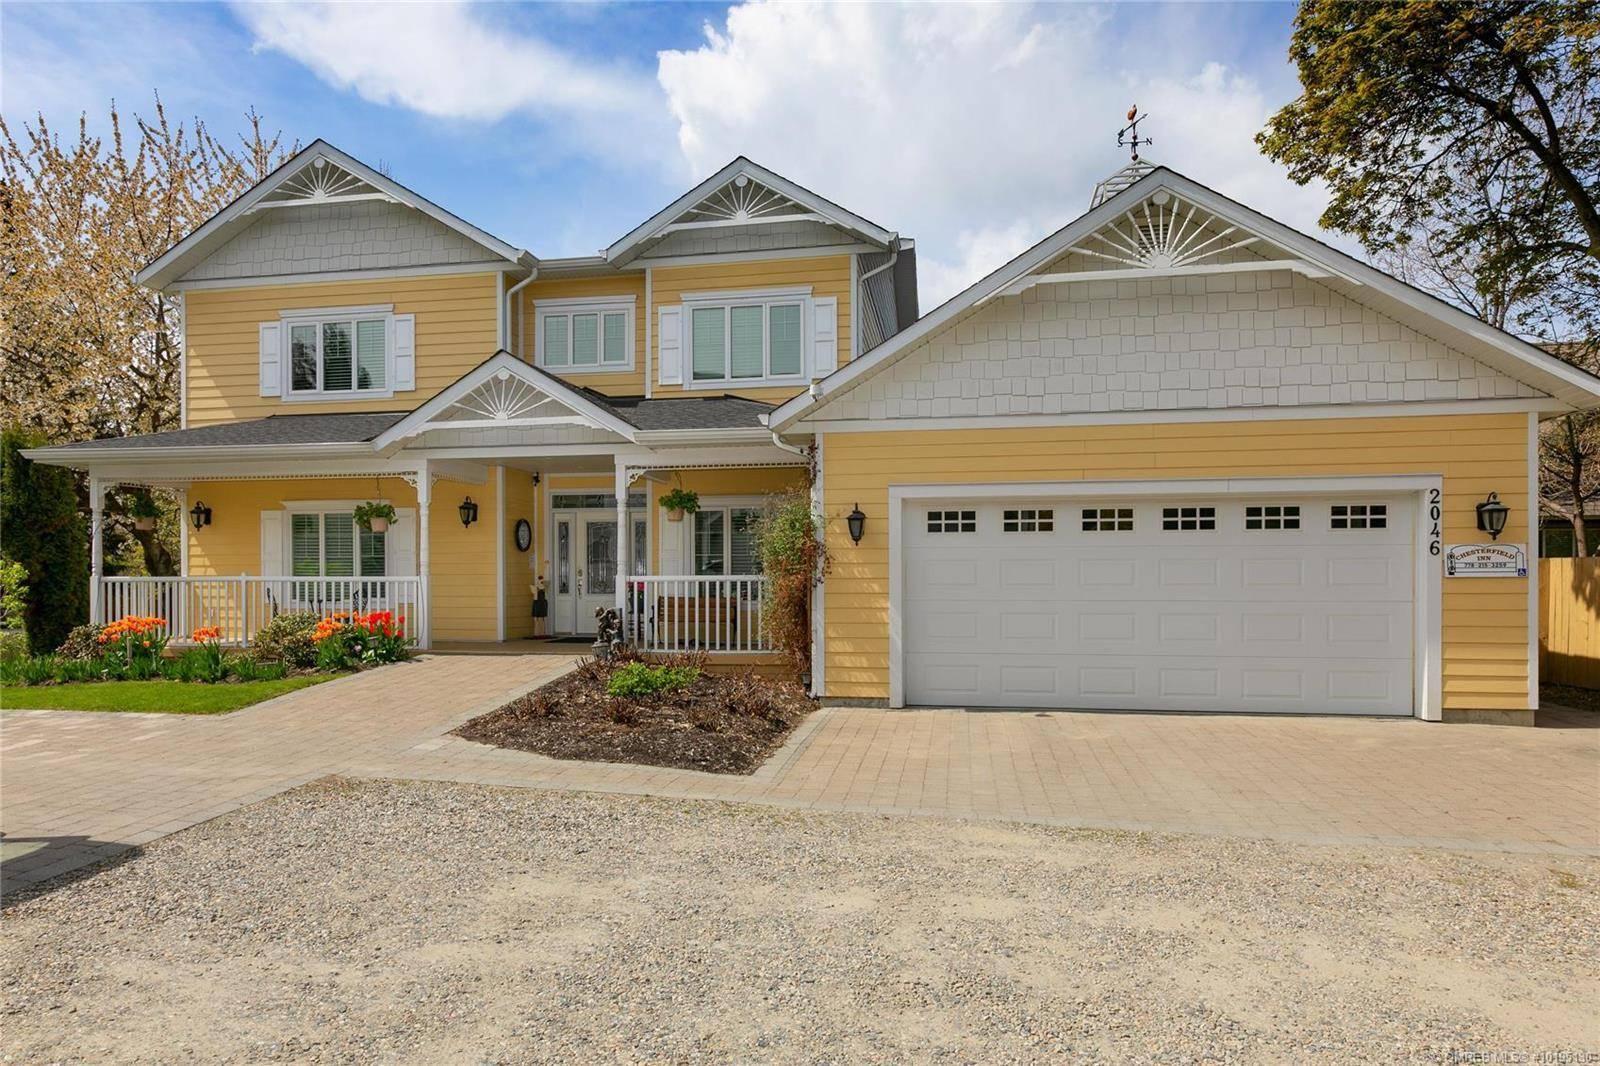 House for sale at 2046 Pandosy St Kelowna British Columbia - MLS: 10195130